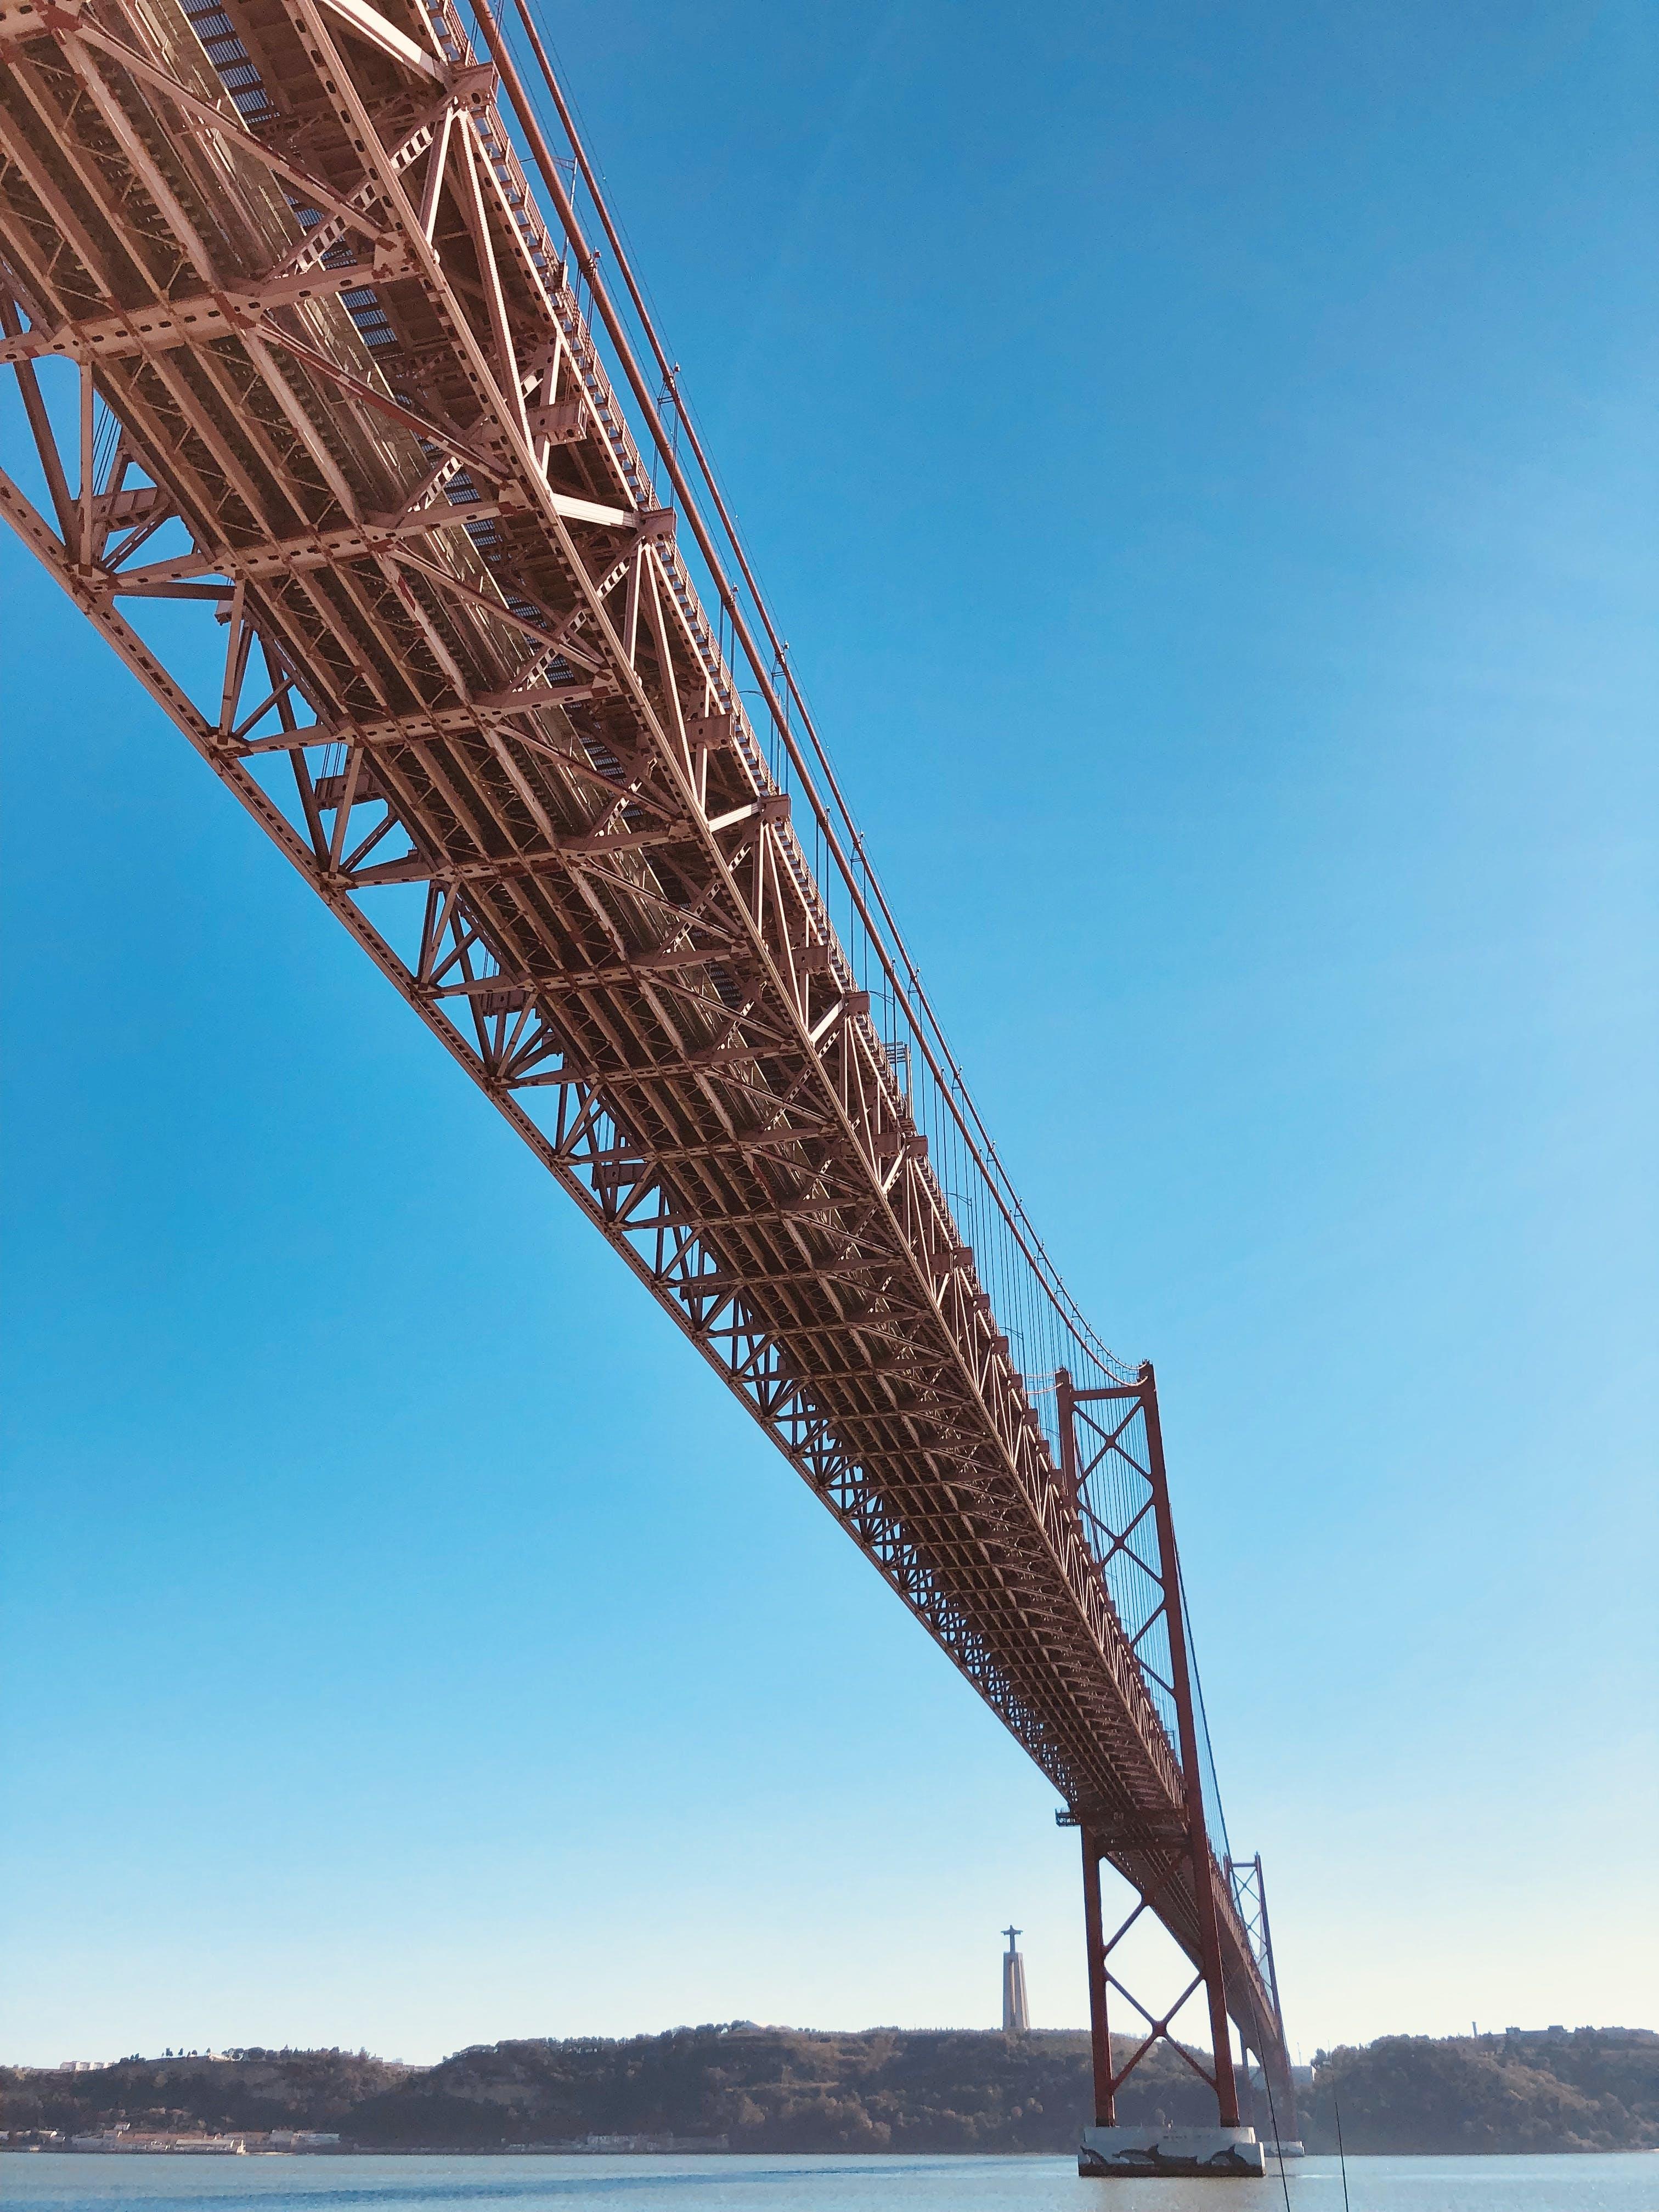 Low Angle Photo of Bridge Under Blue Sky